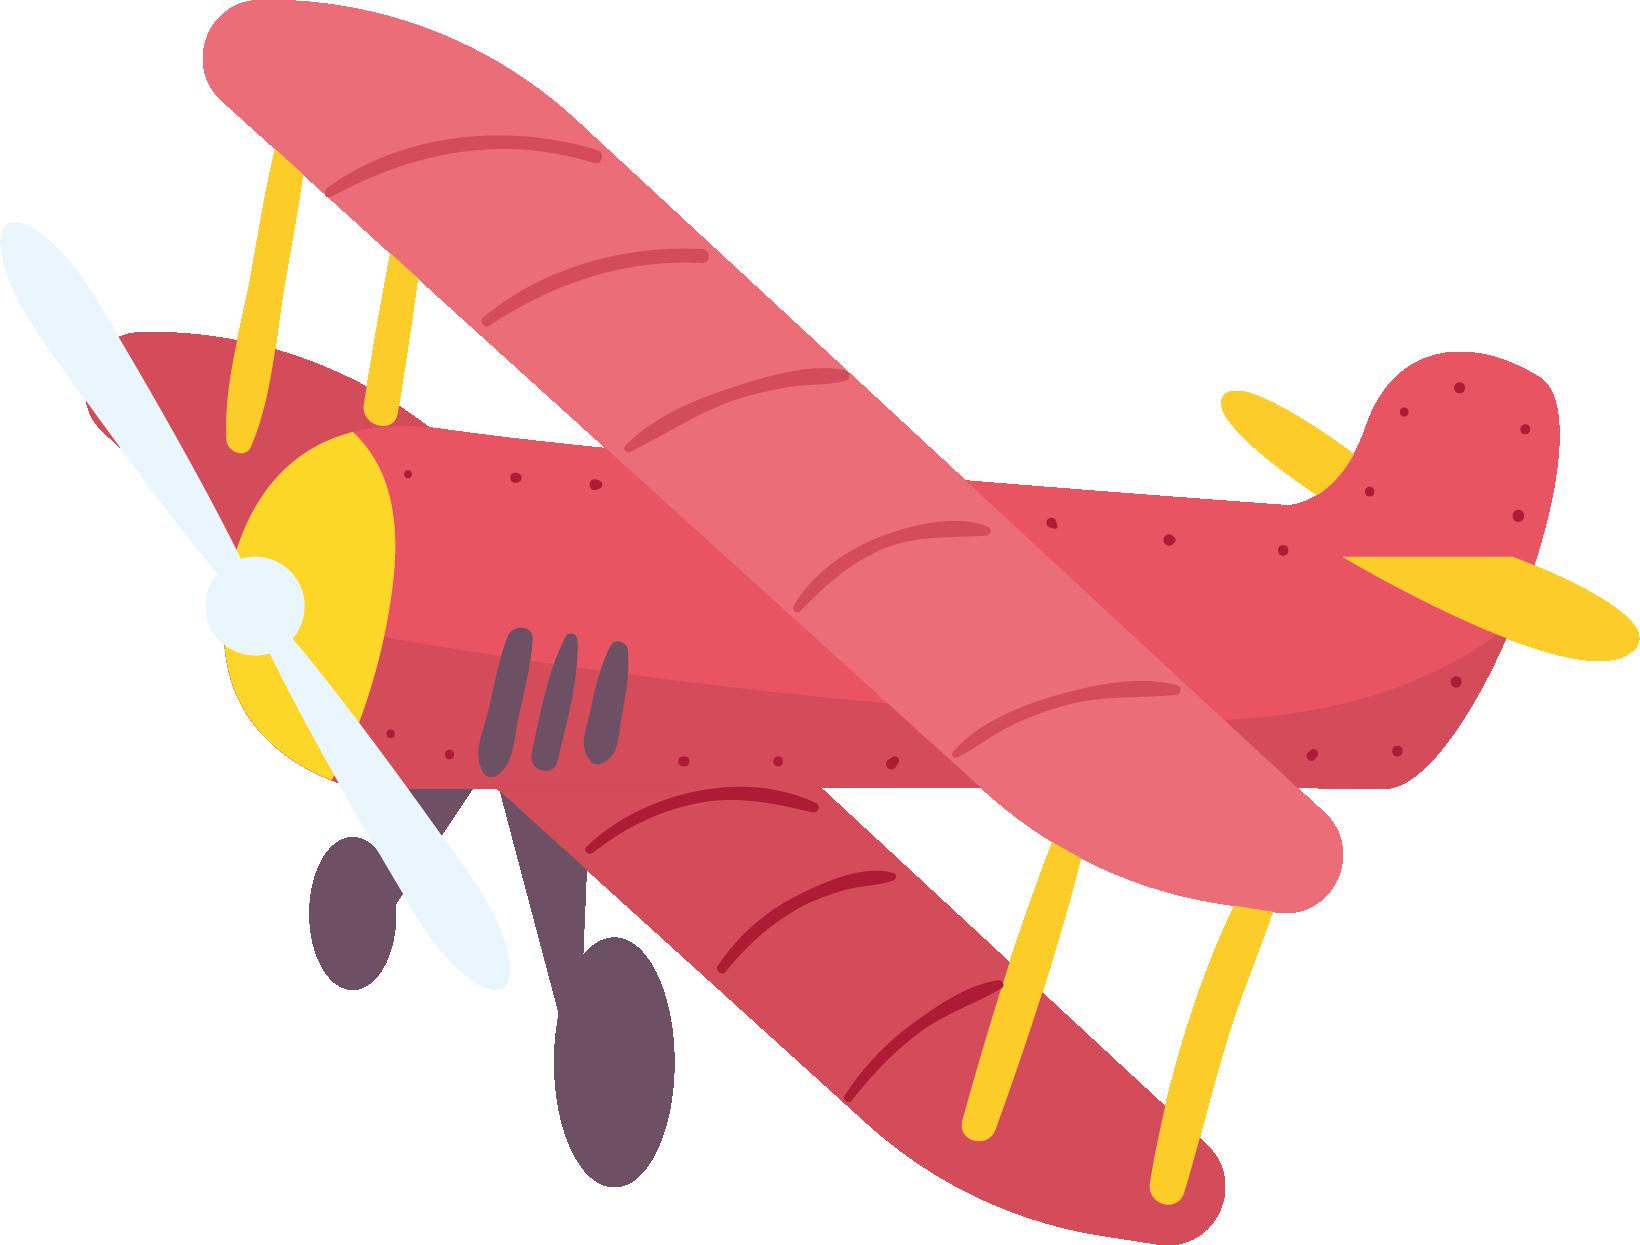 Vintage airport clipart transparent clip art Airplane Aircraft Cartoon Illustration - The falling plane ... clip art